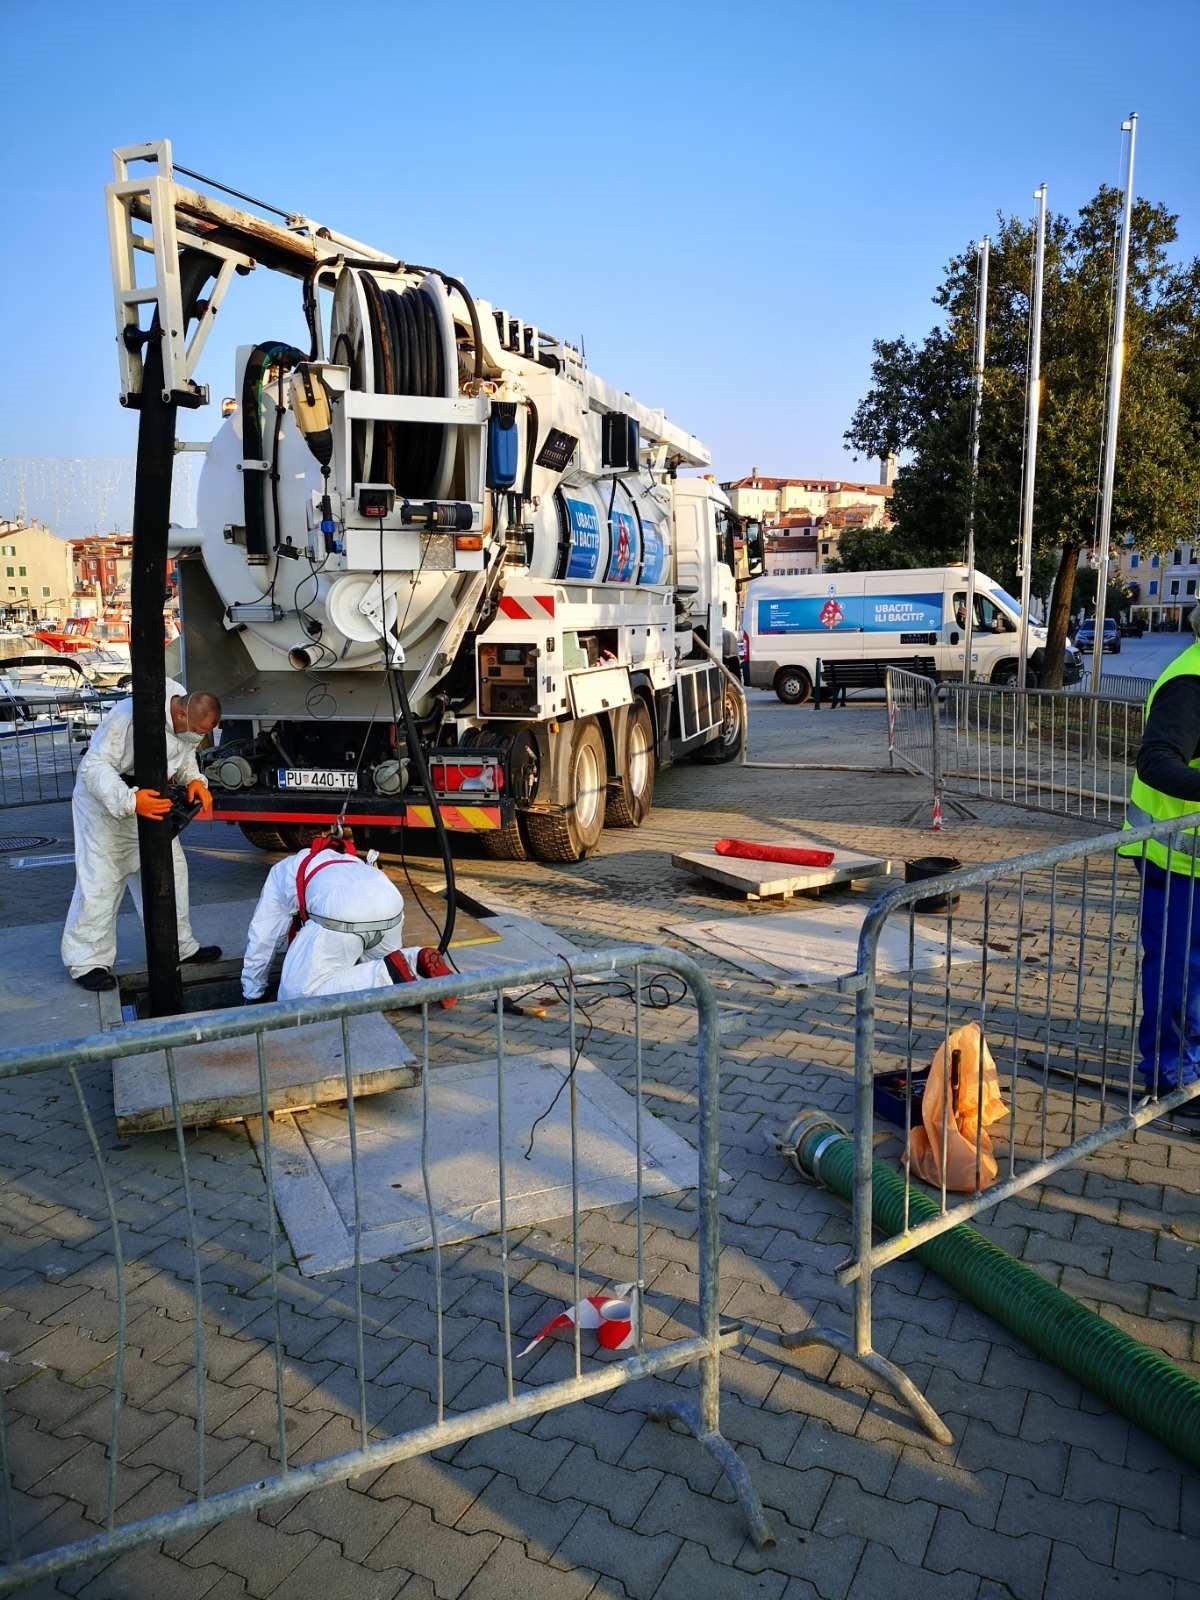 Kako napreduje izgradnja Postrojenja za pročišćavanje otpadnih voda aglomeracije Rovinj?